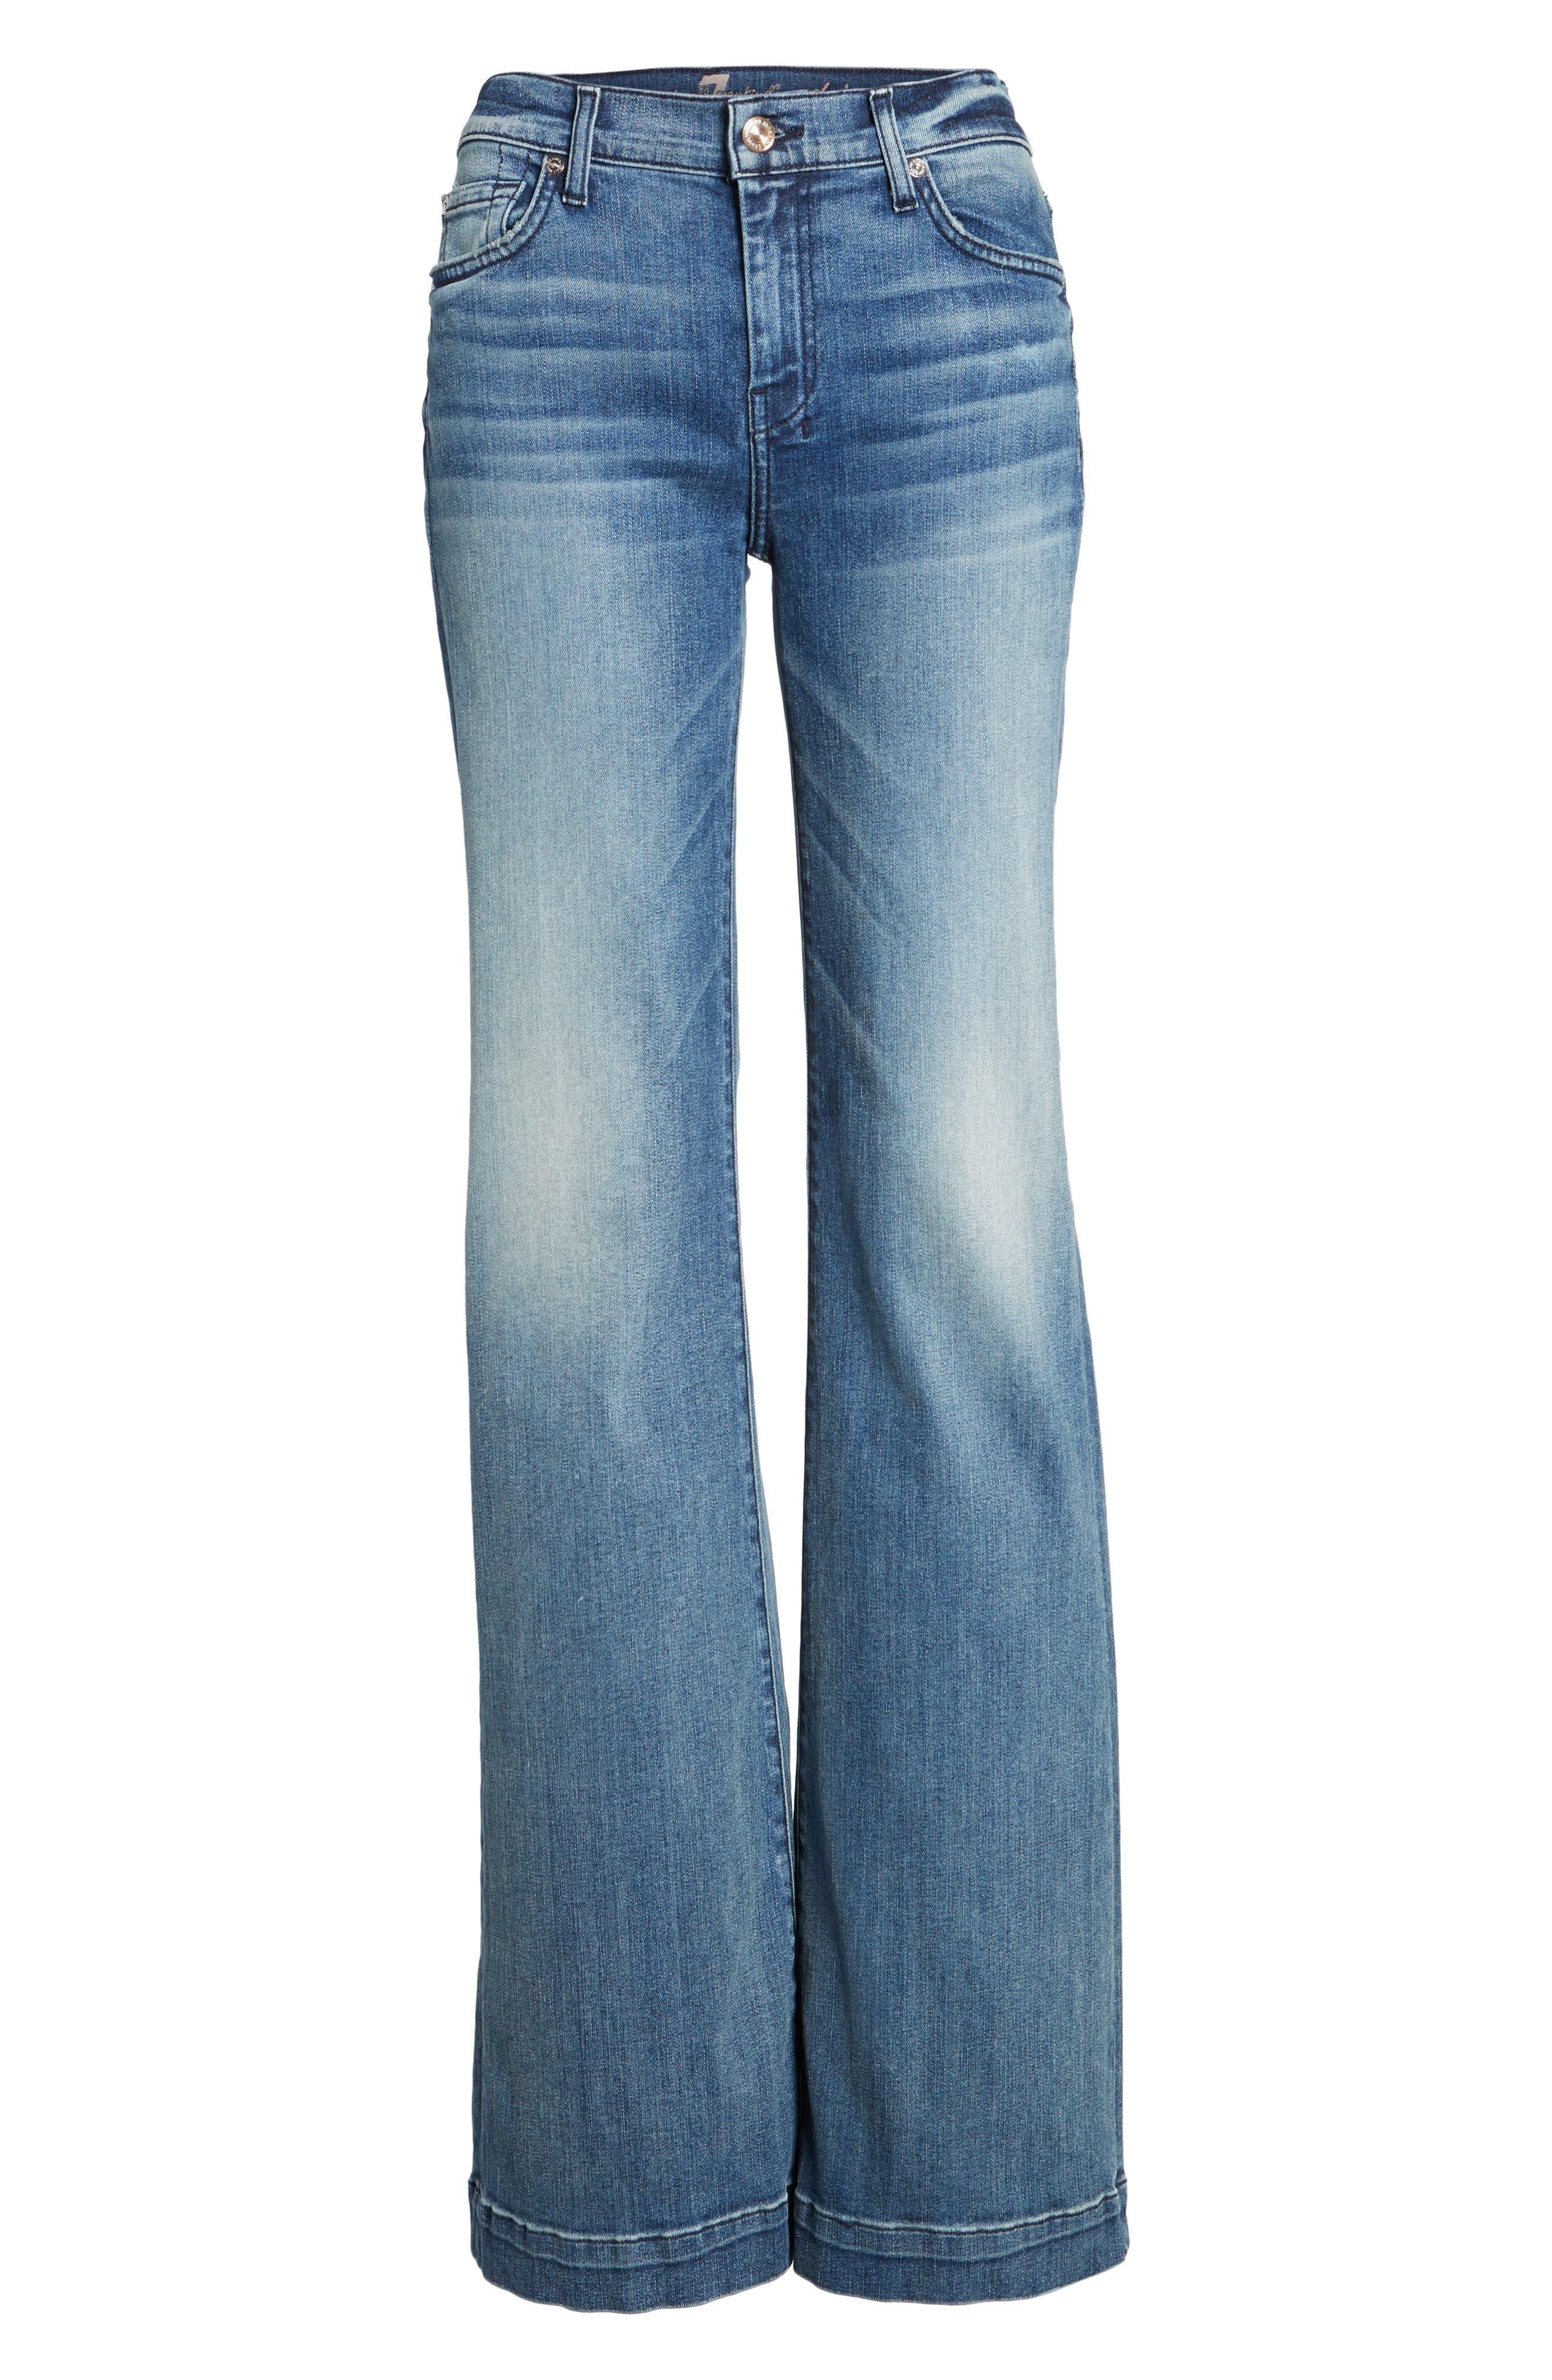 Tailorless Dojo Wide Leg Jeans,                             Alternate thumbnail 6, color,                             402